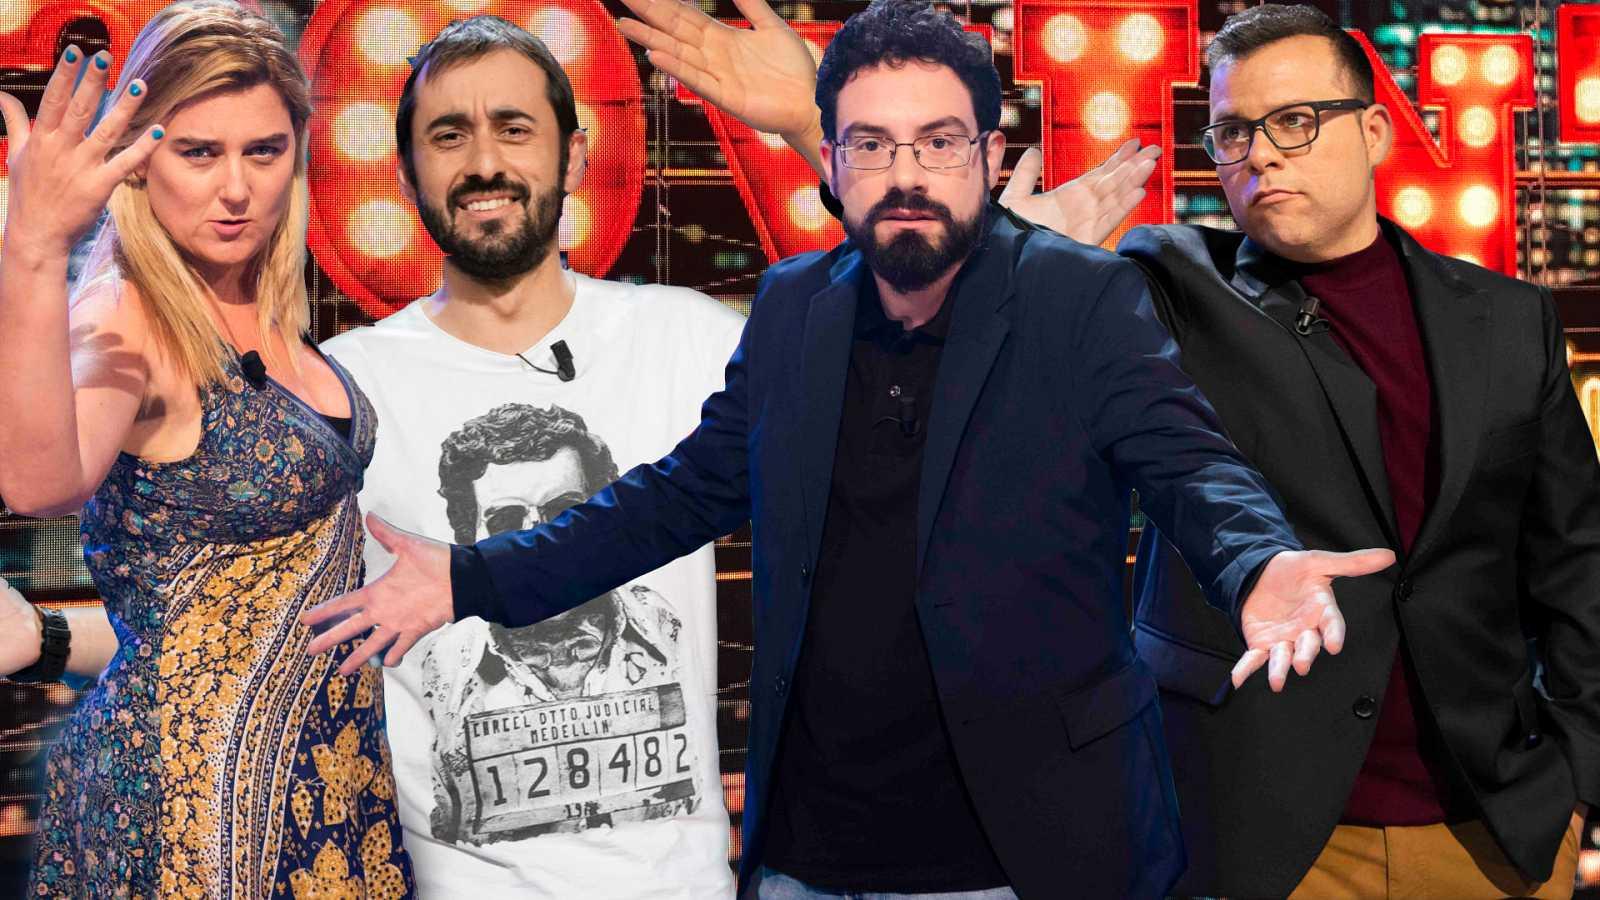 Toni Mata, Imma Sust, Javi Sancho, Carlo Padial